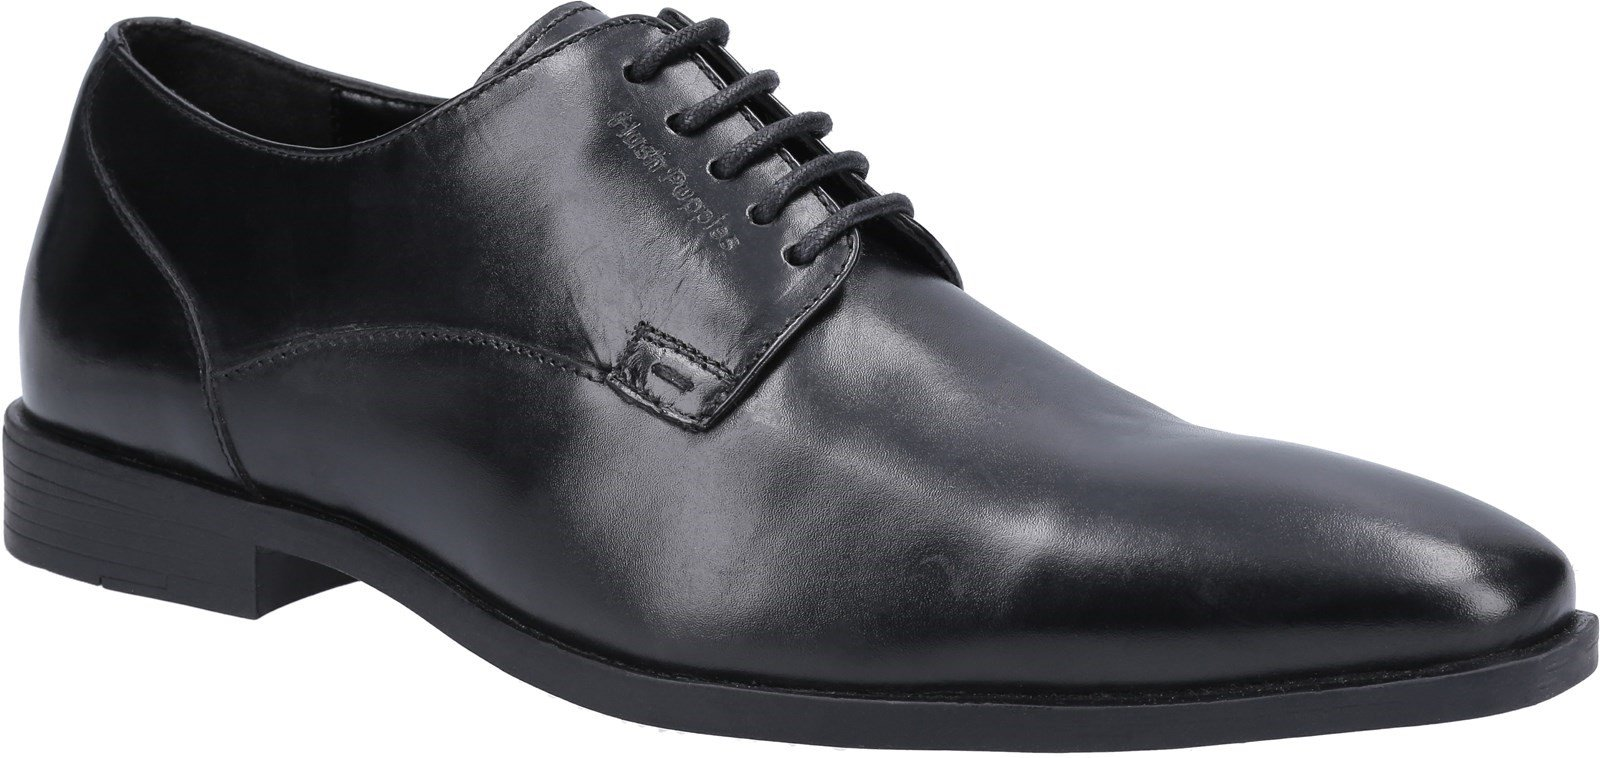 Hush Puppies Men's Ezra School Oxford Shoe Black 30816 - Black 6